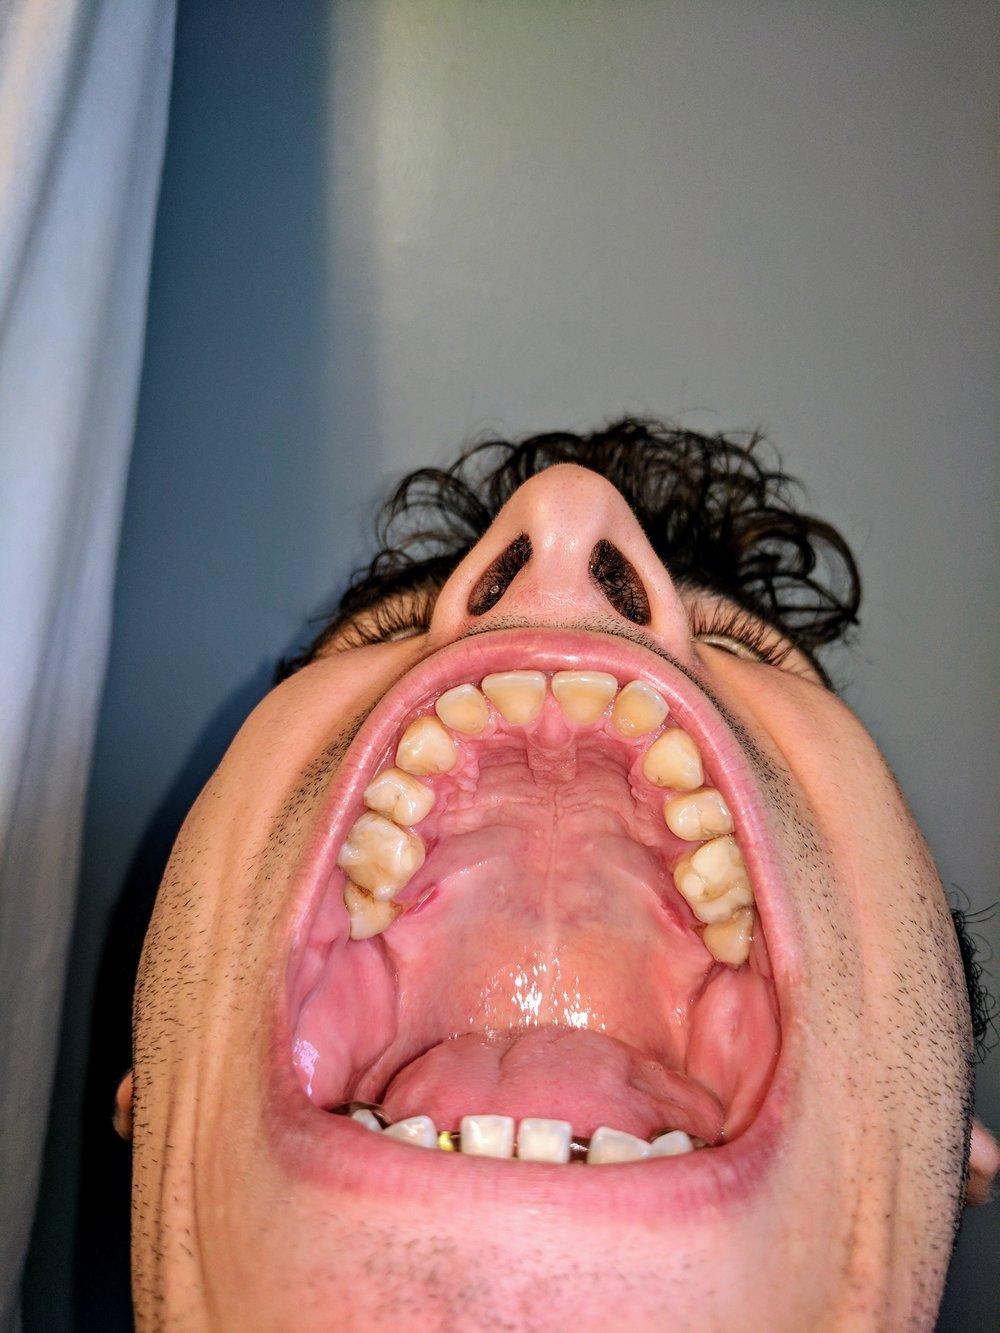 What flaring teeth look like.